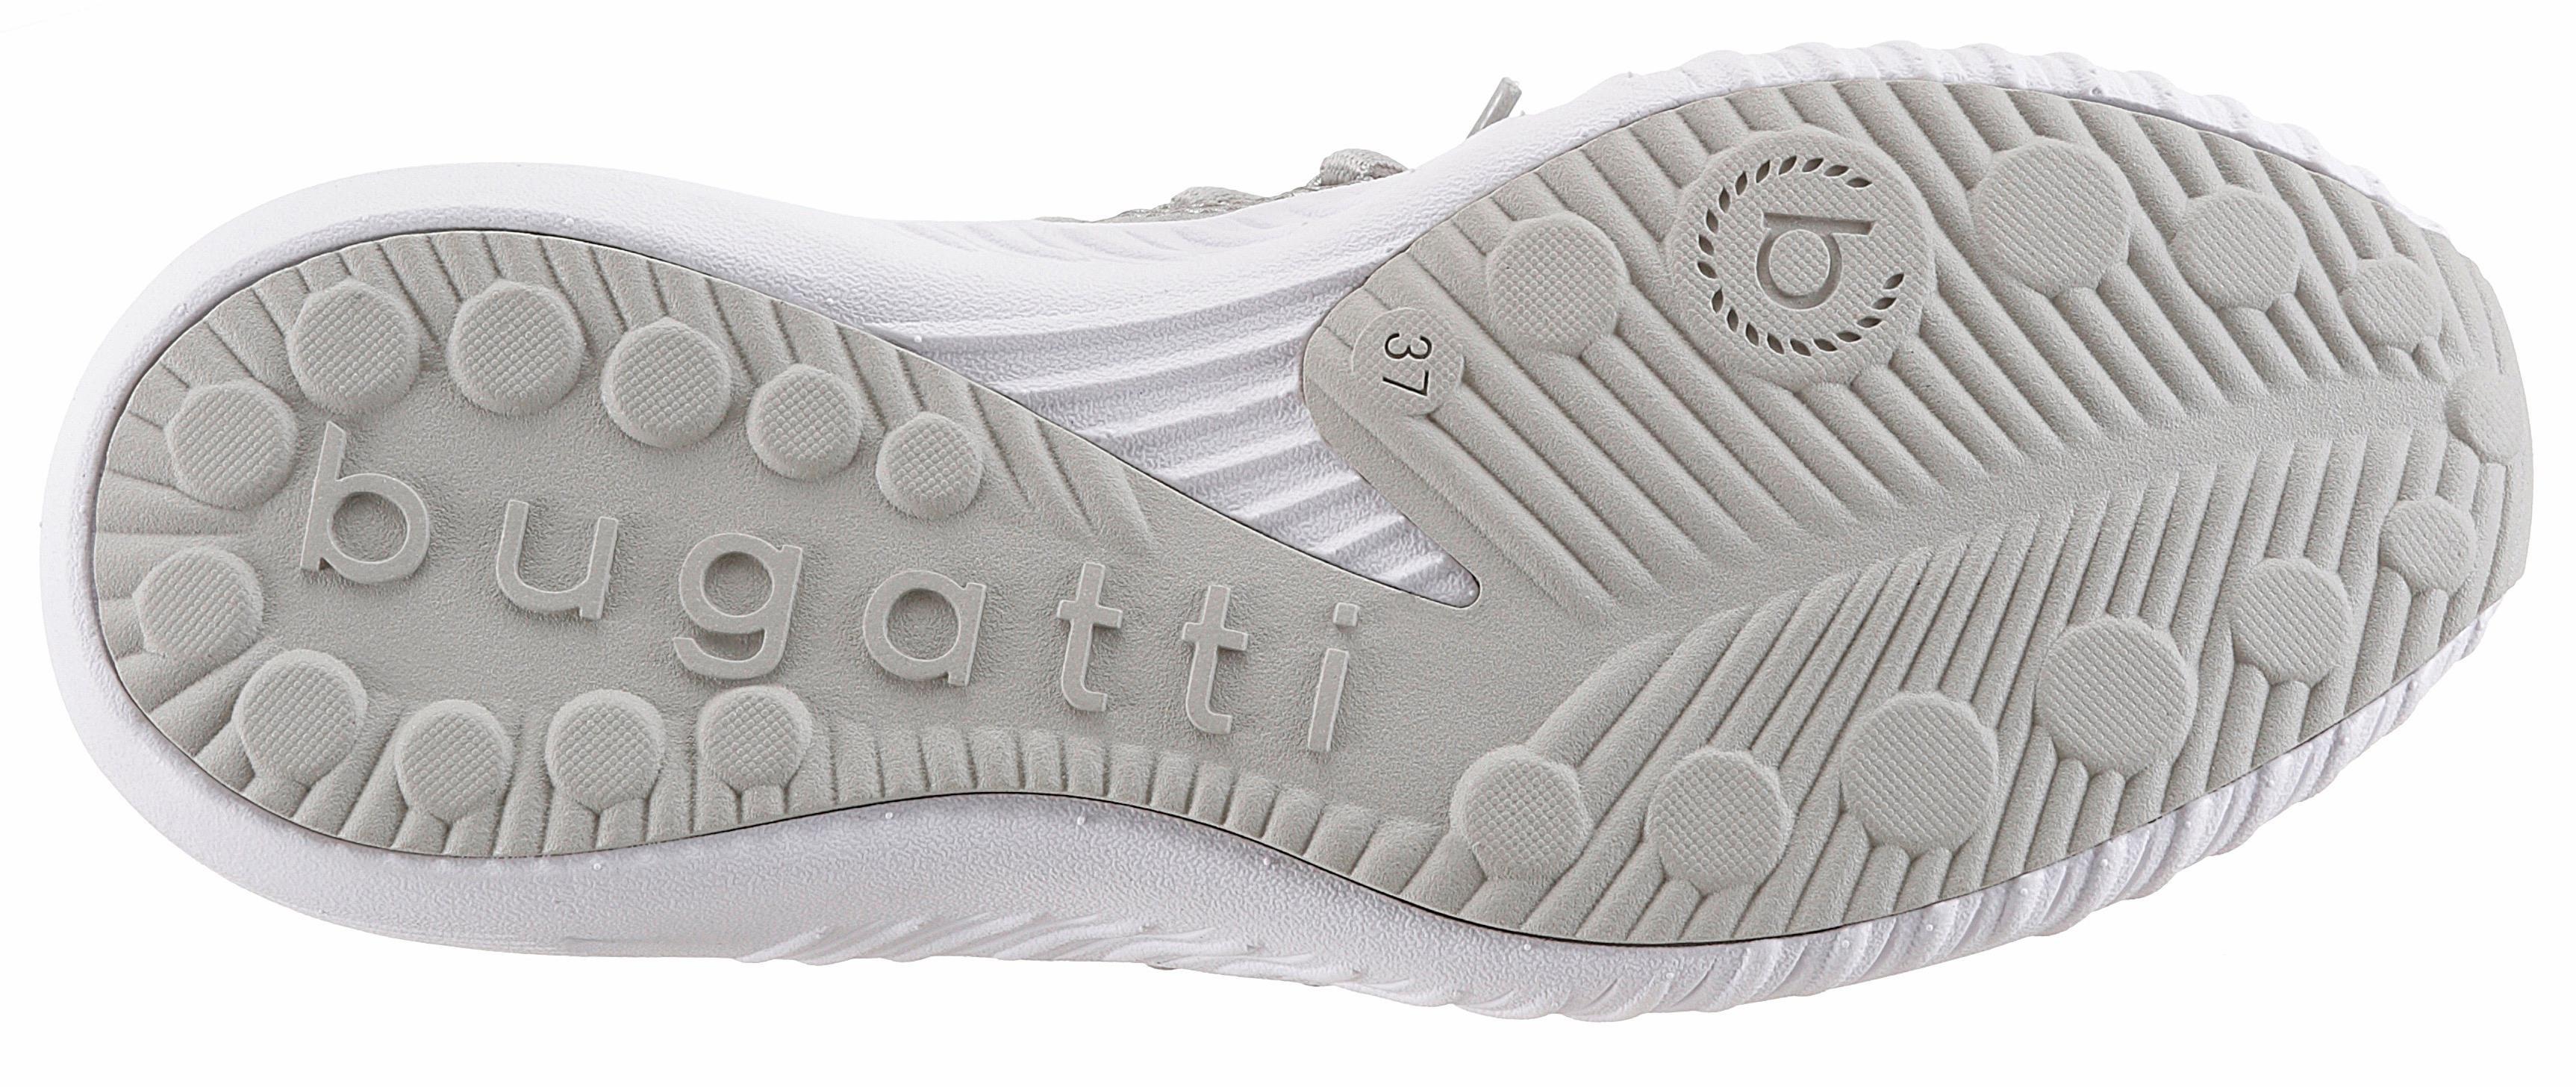 Sneakers Bugatti In De Online Winkel 4RcjLq35SA